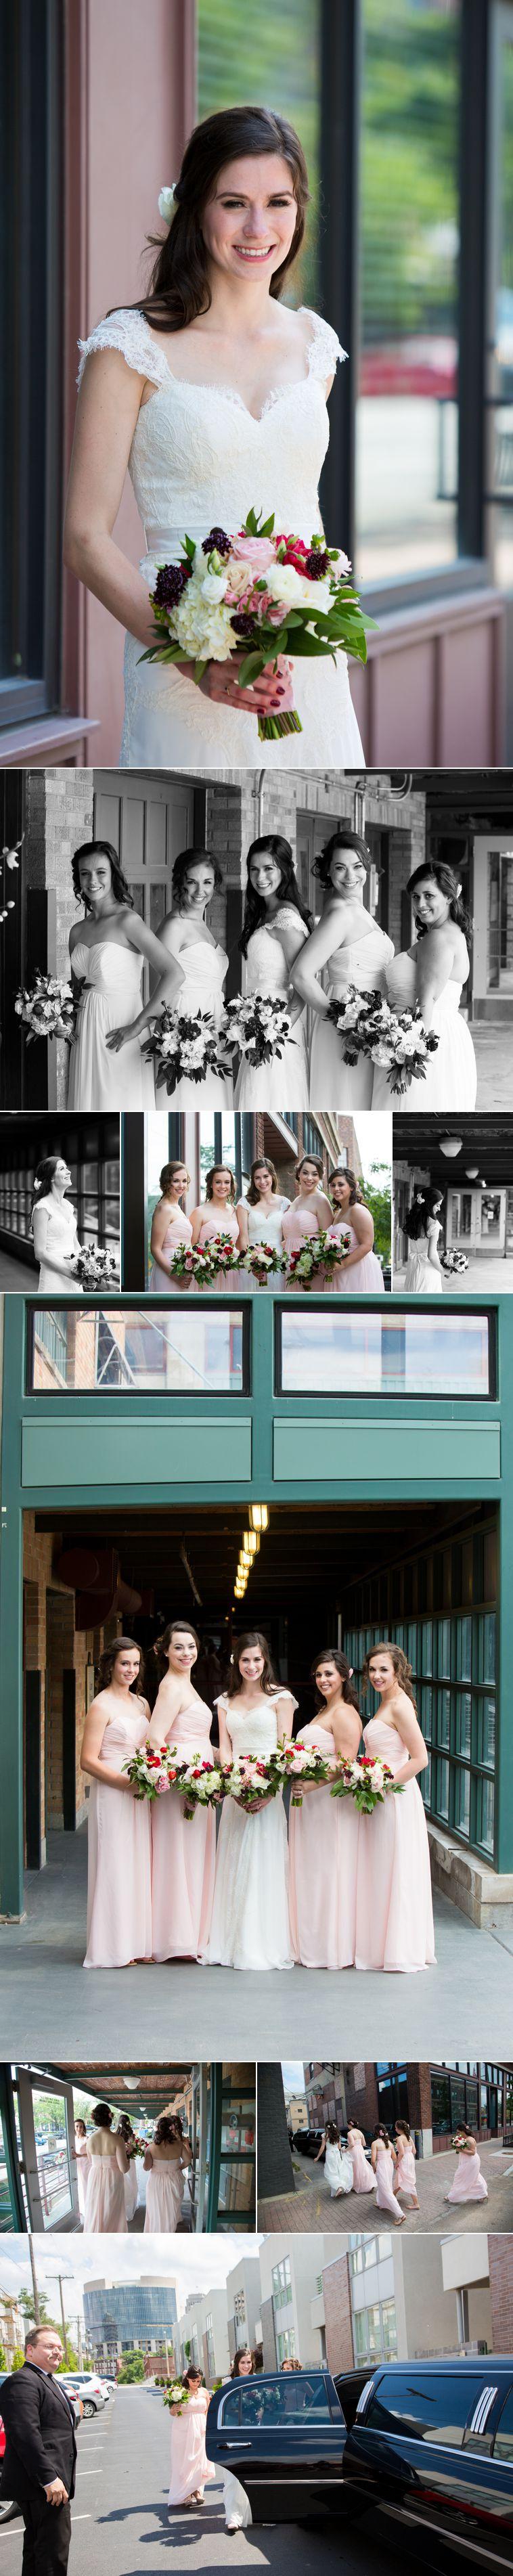 04_Kansas City Wedding Photography